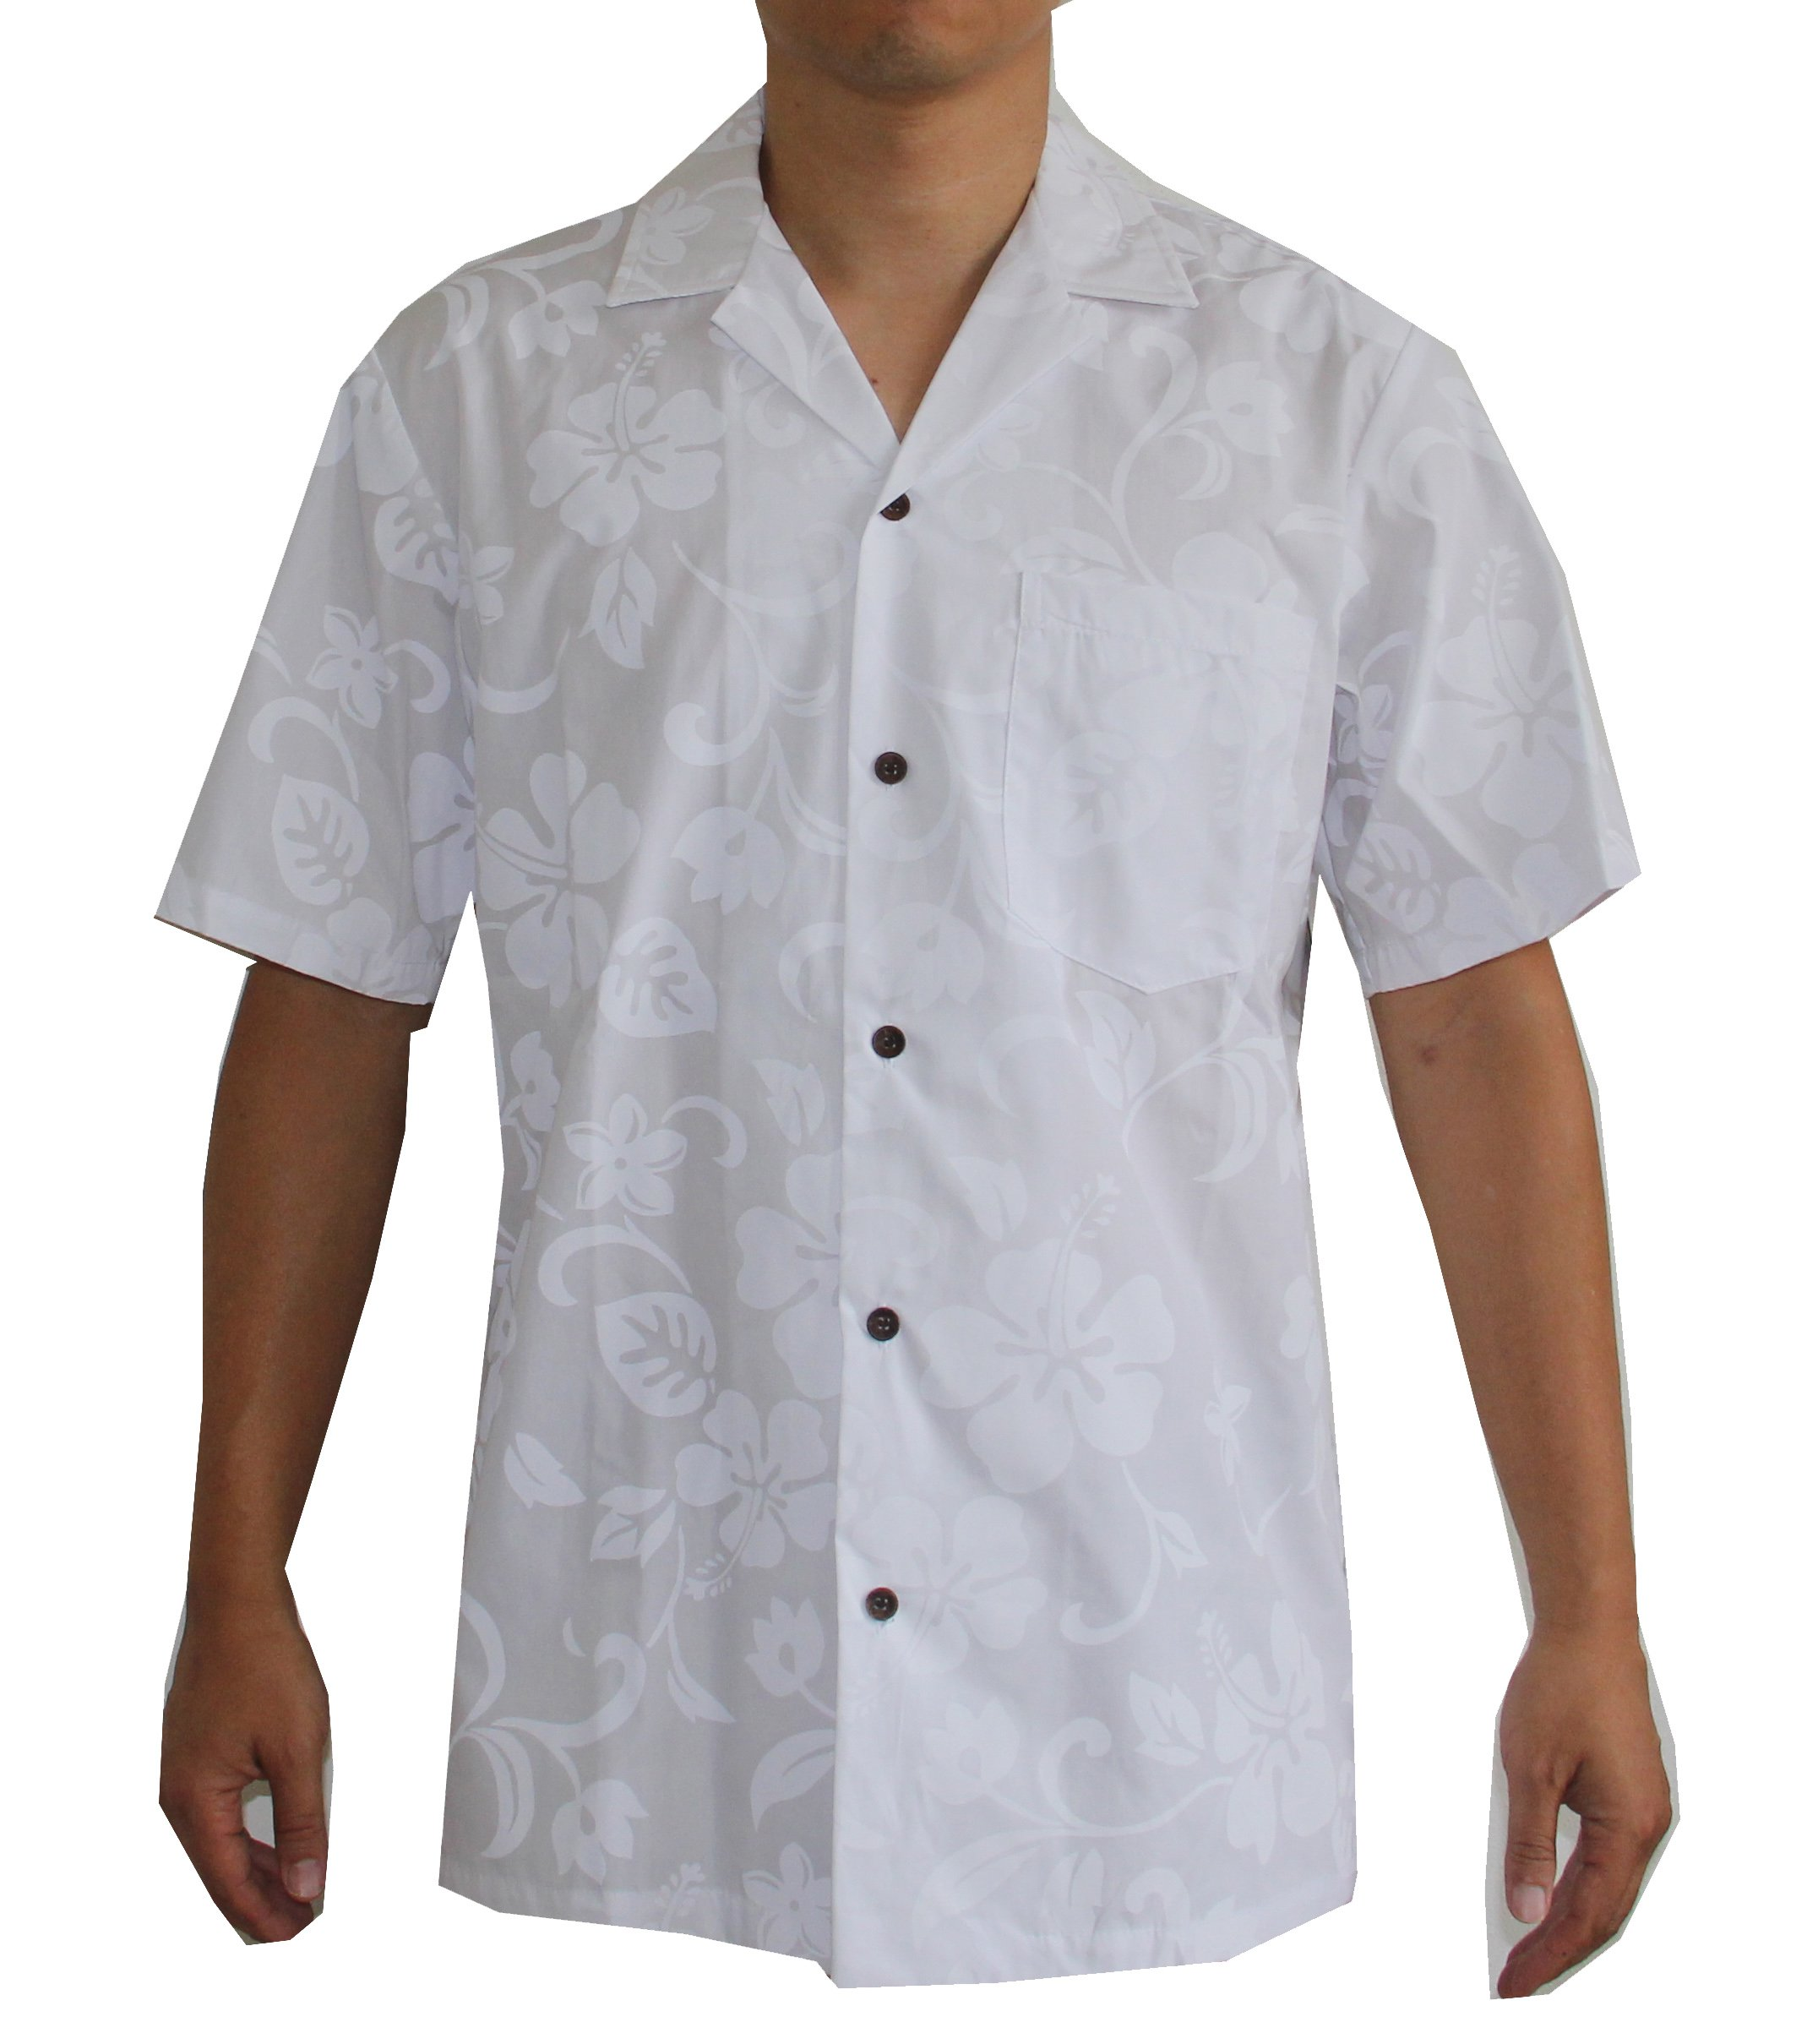 Alohawears Clothing Company Men's White Wedding Hawaiian Aloha Shirt (L)